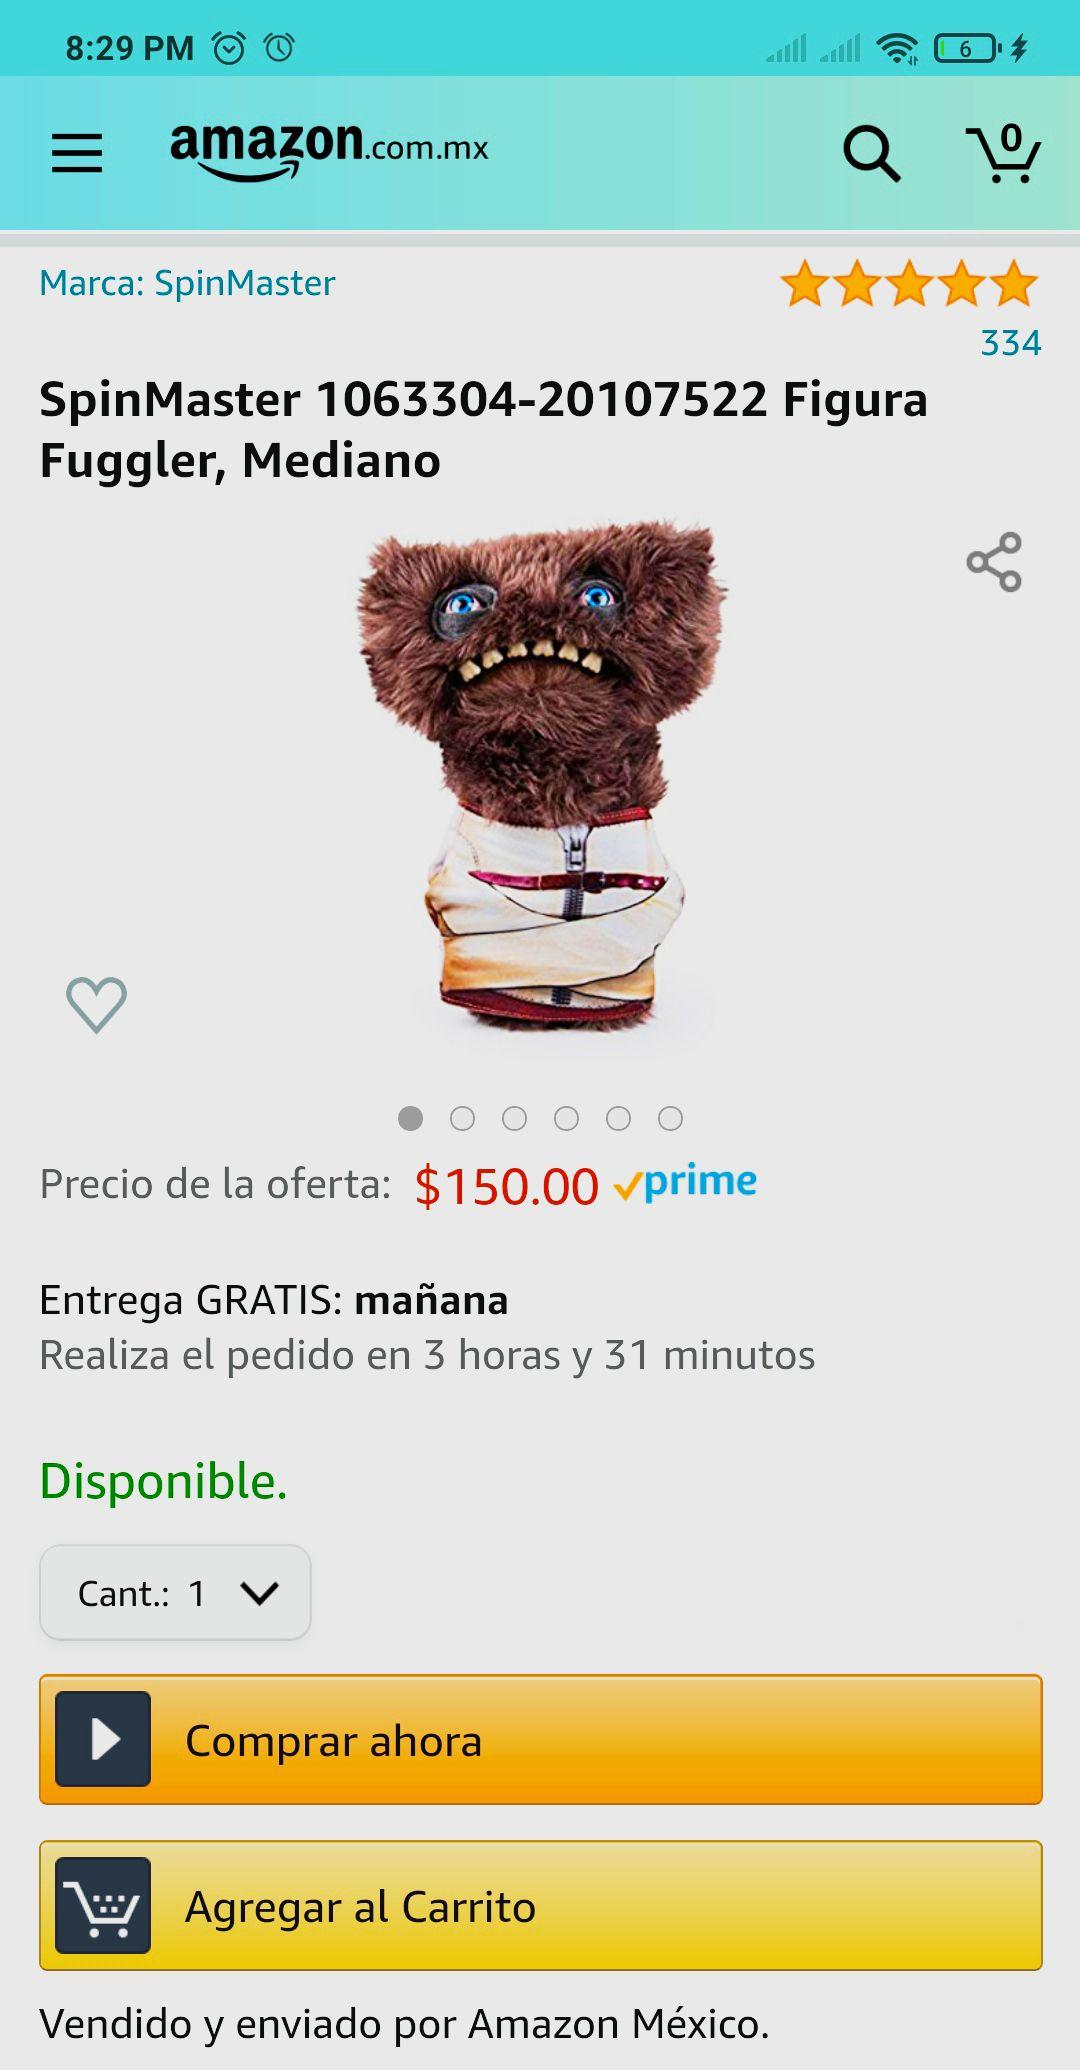 Amazon: Fuggler Mediano